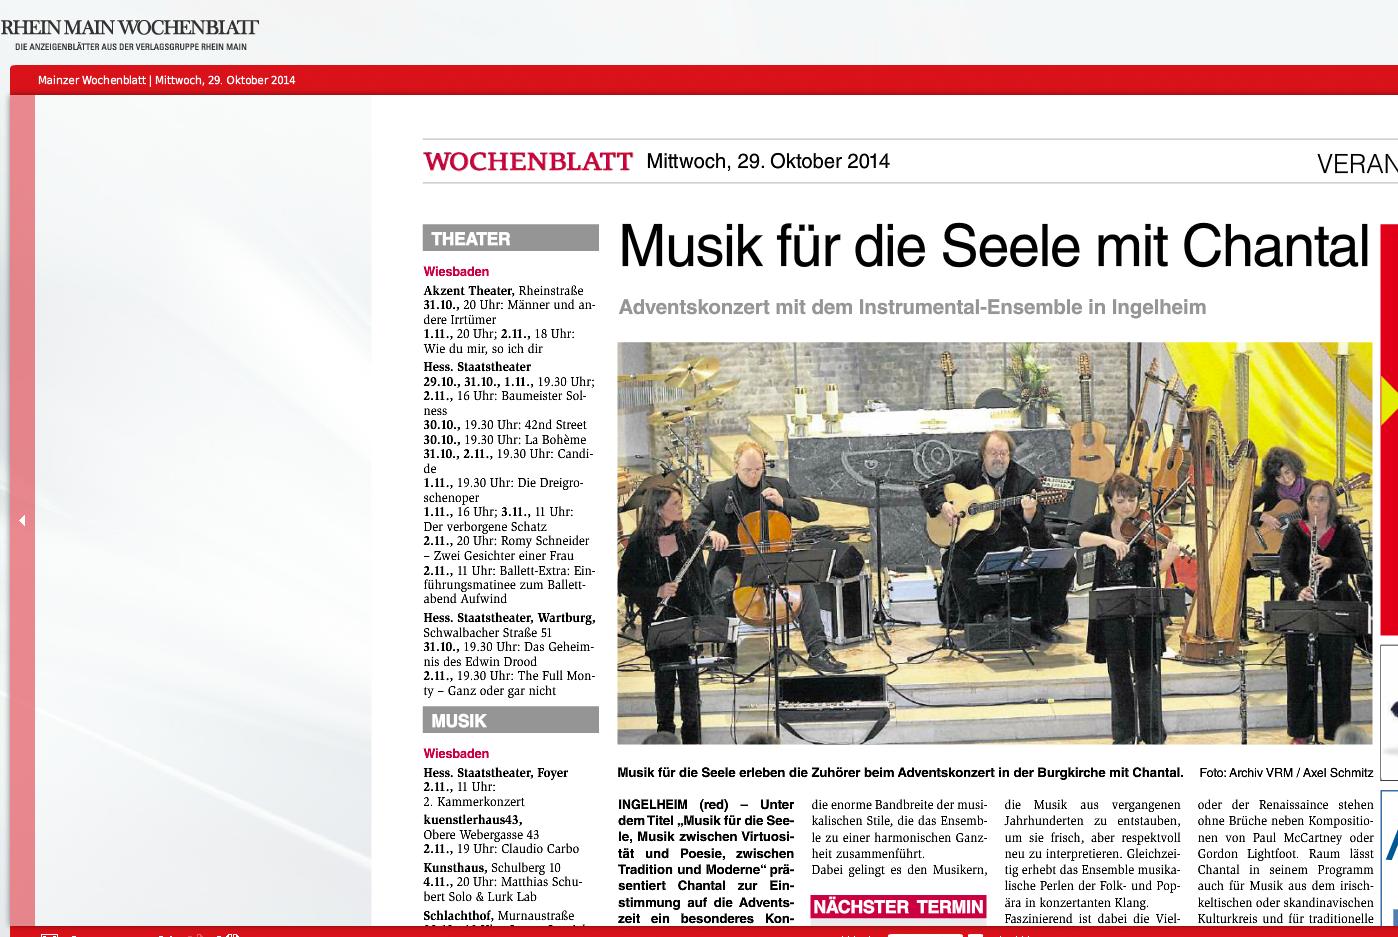 Wochenblatt: Konzerthinweis